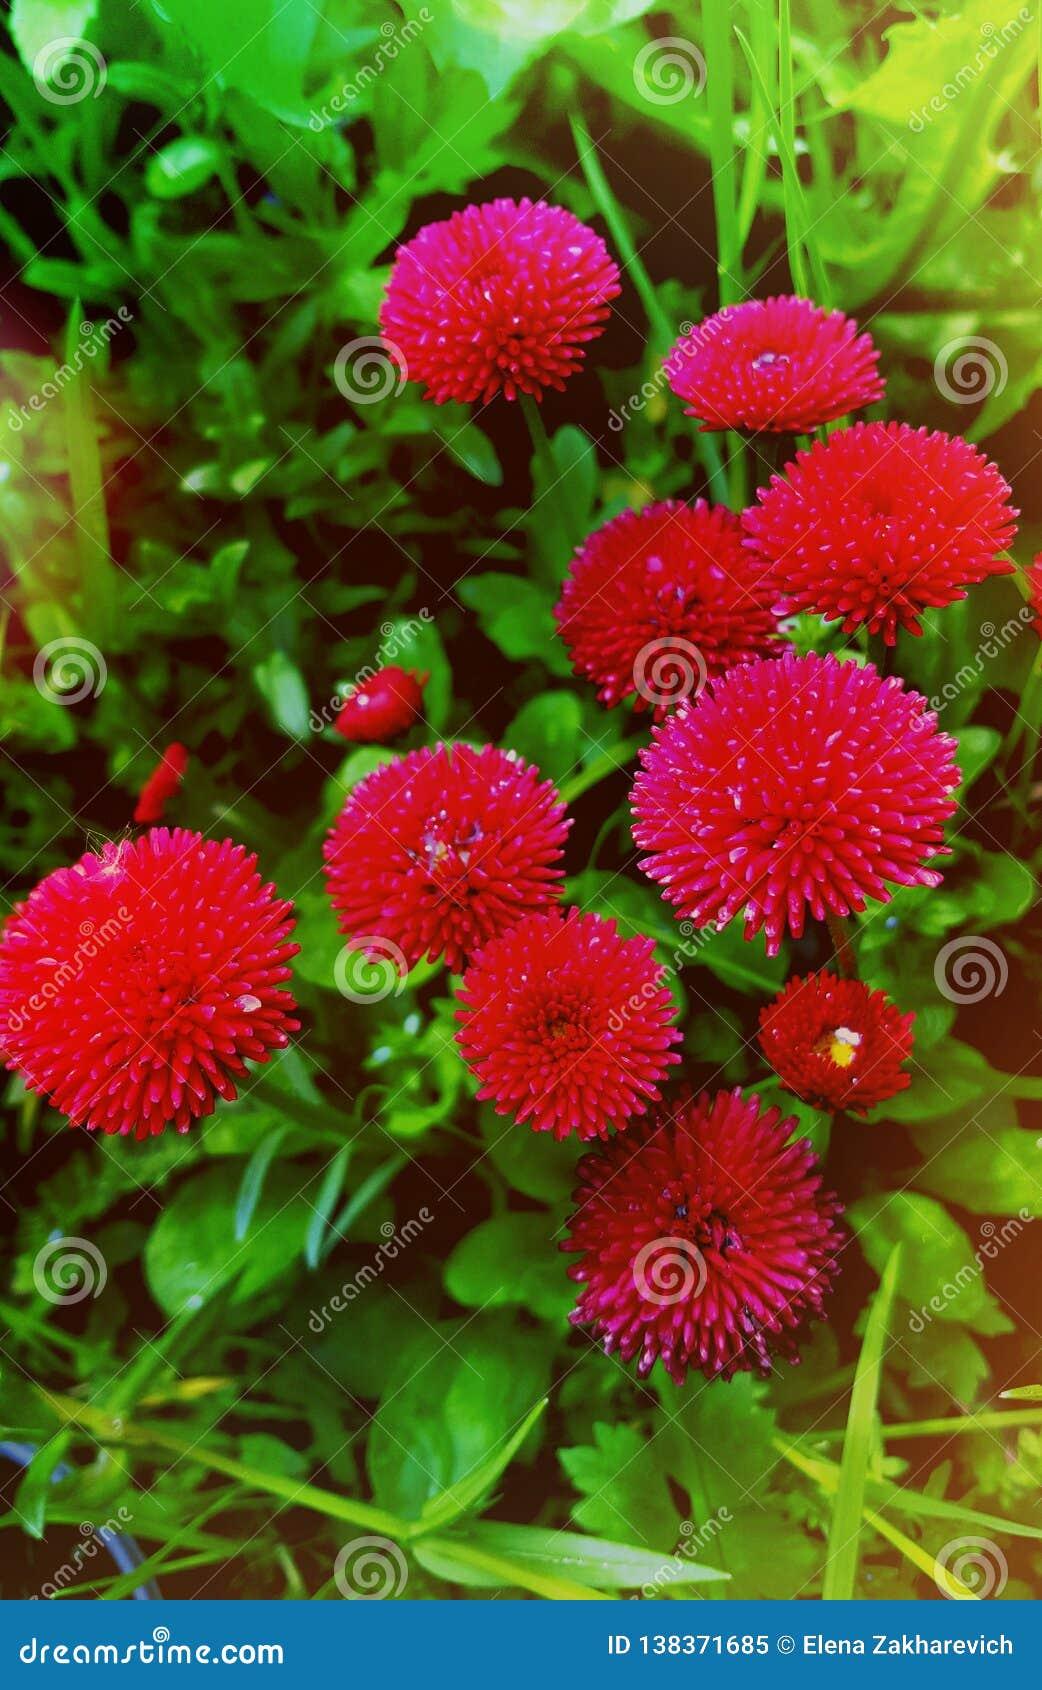 Margaridas vermelhas no jardim